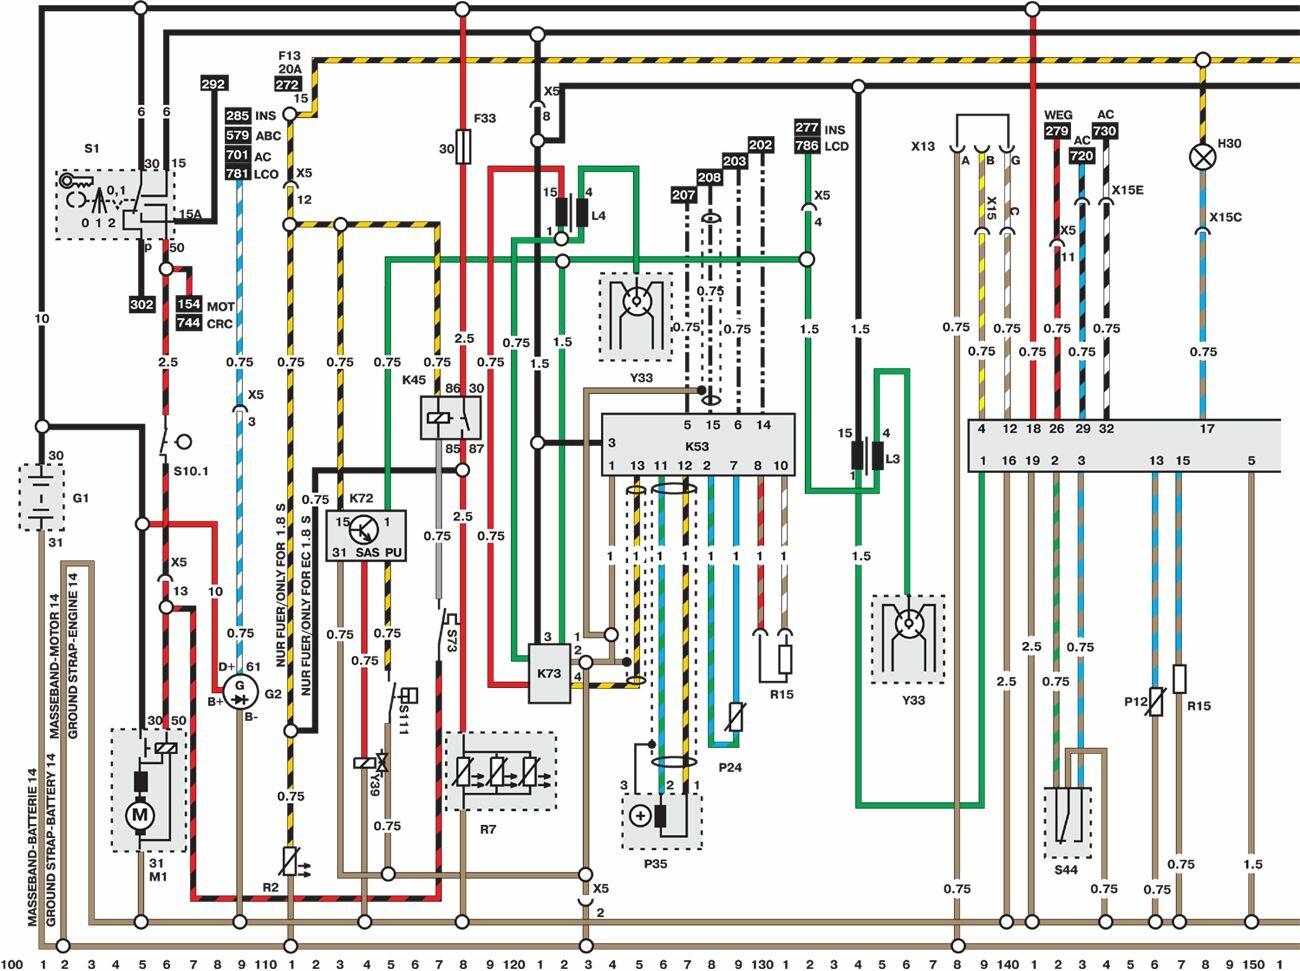 vectra b xenon wiring diagram marine battery isolator switch ЭЛЕКТРОСХЕМА ОПЕЛЬ ОМЕГА СХЕМА ЭЛЕКТРООБОРУДОВАНИЯ